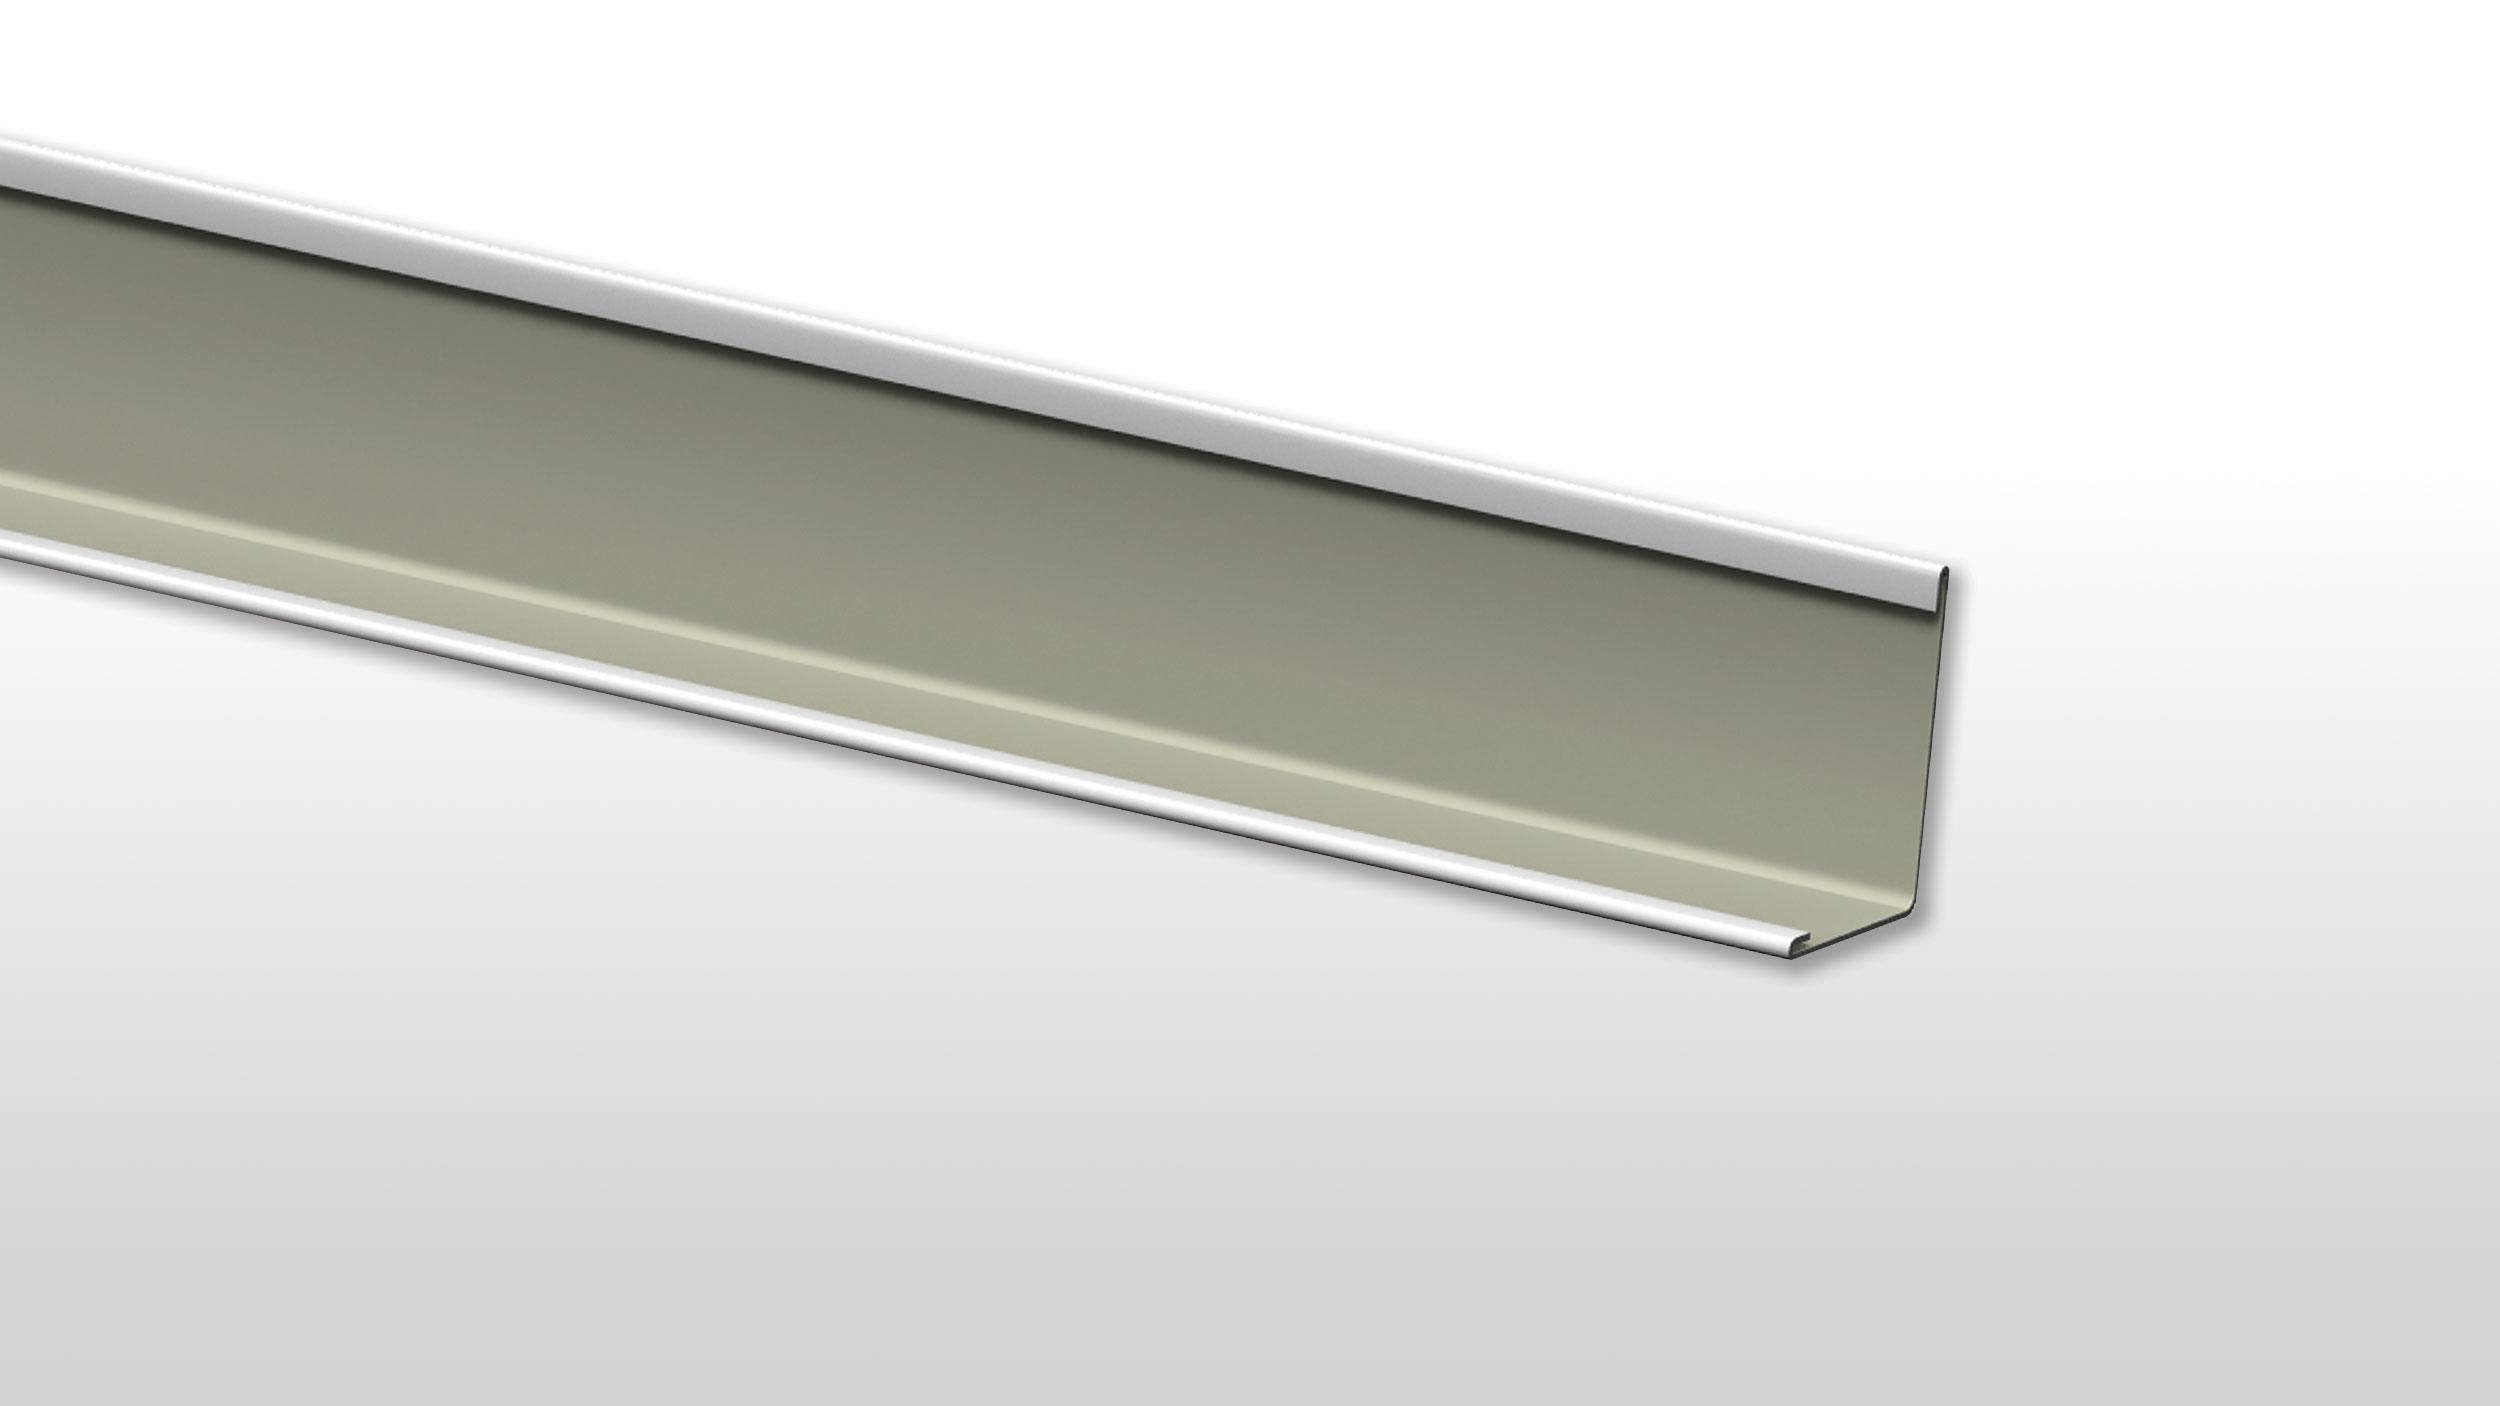 Rockfon Chicago Metallic Kantprofil 24/24 hvit 305cm 20stk